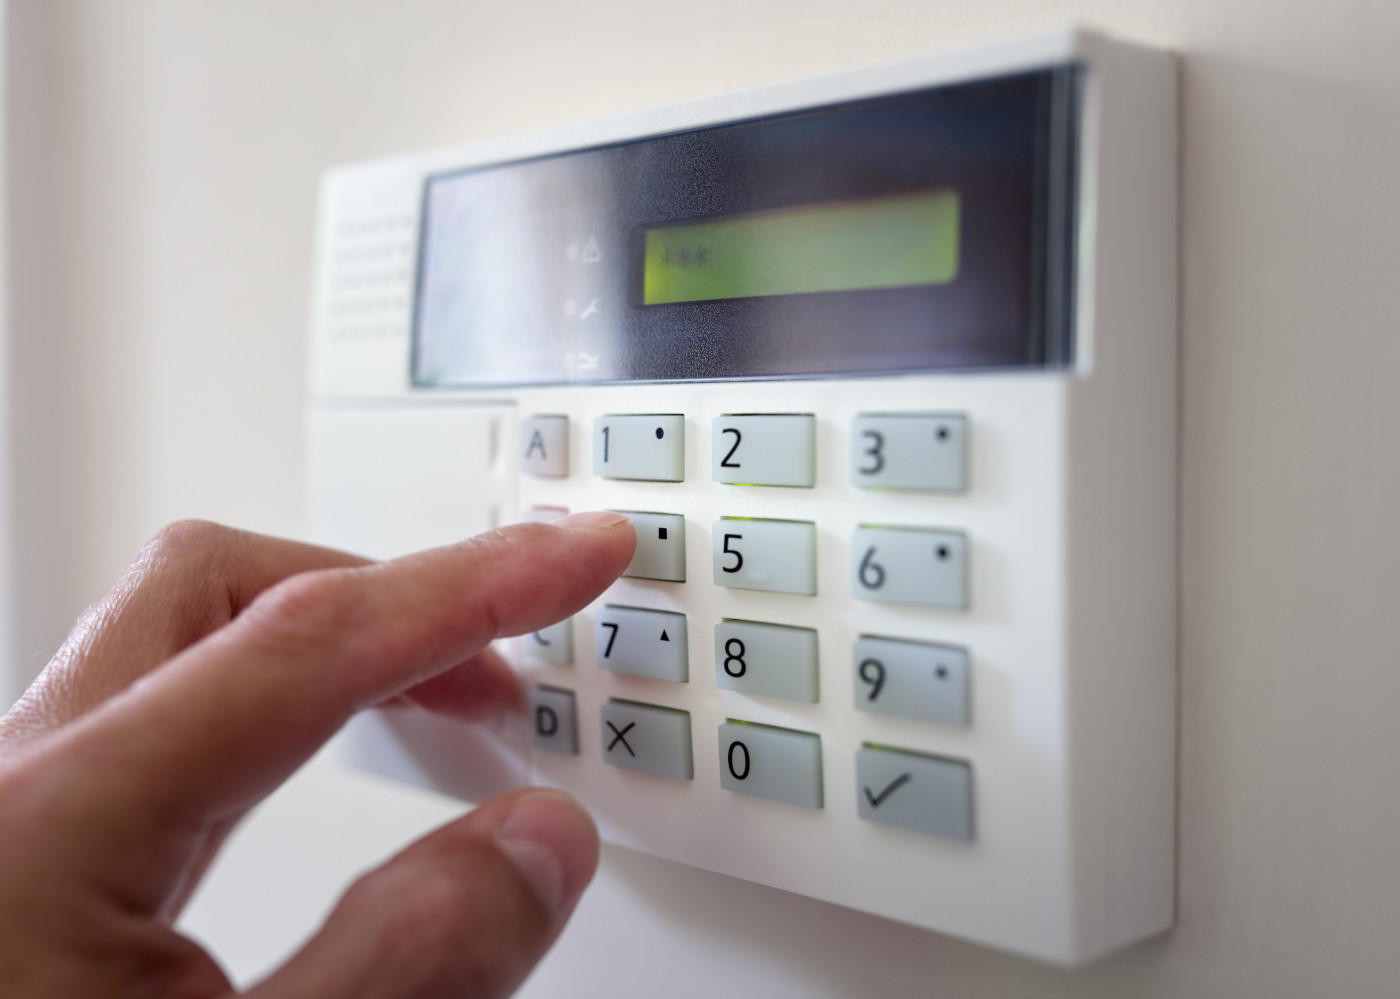 House Alarms